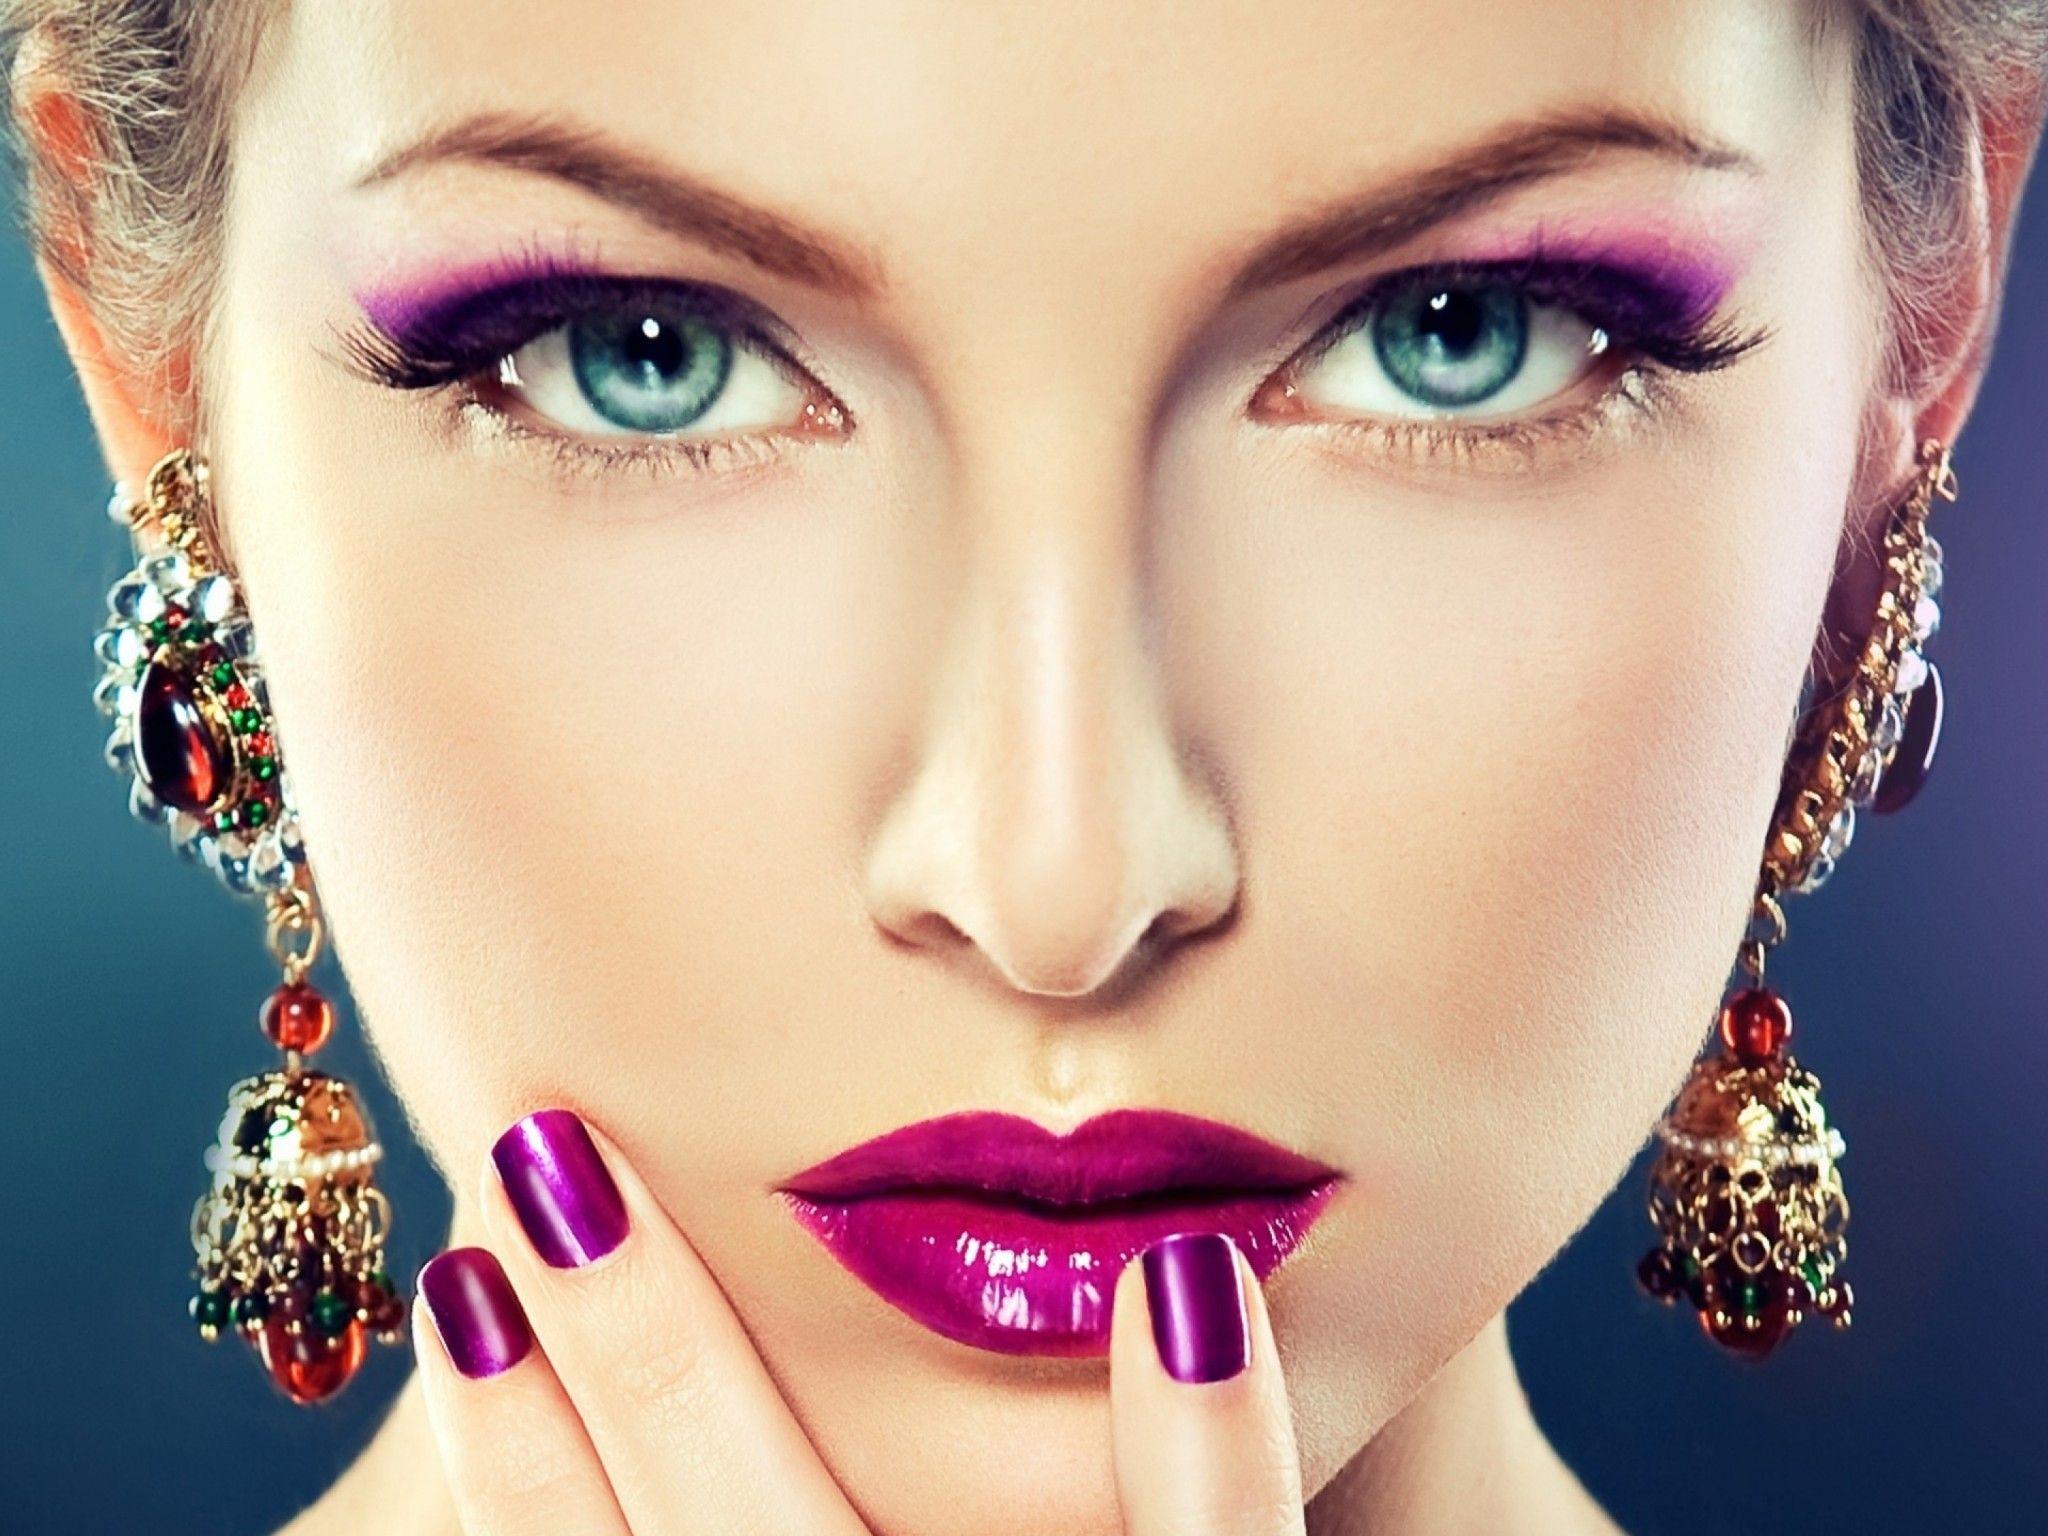 4K Ultra HD Women girl makeup 4K Ultra HD wallpaper 4k